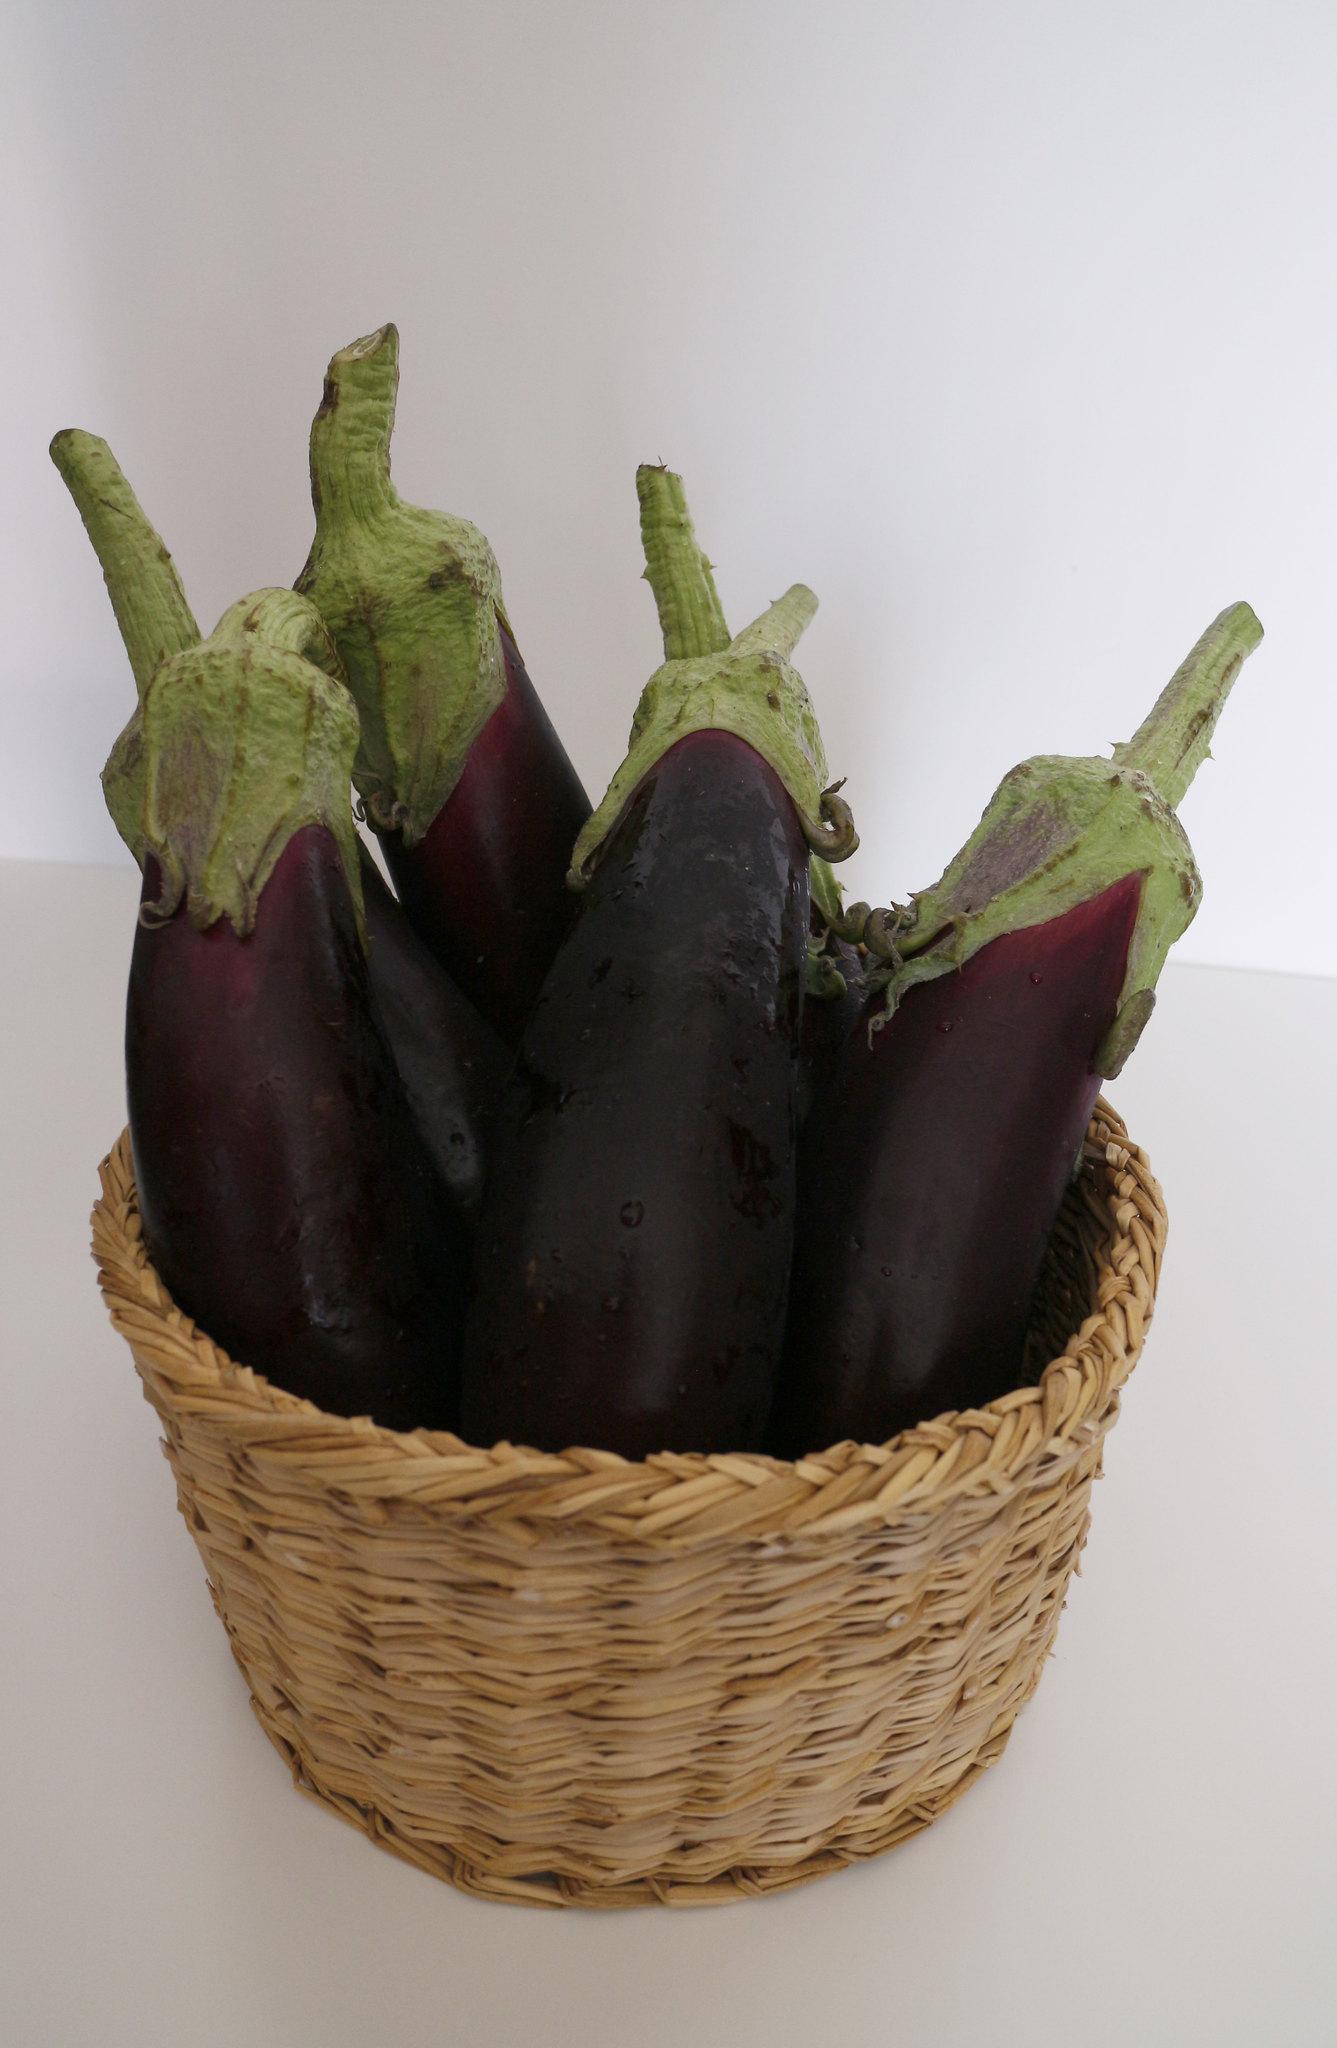 Melanzana nera lunga napoletana var. cima di viola